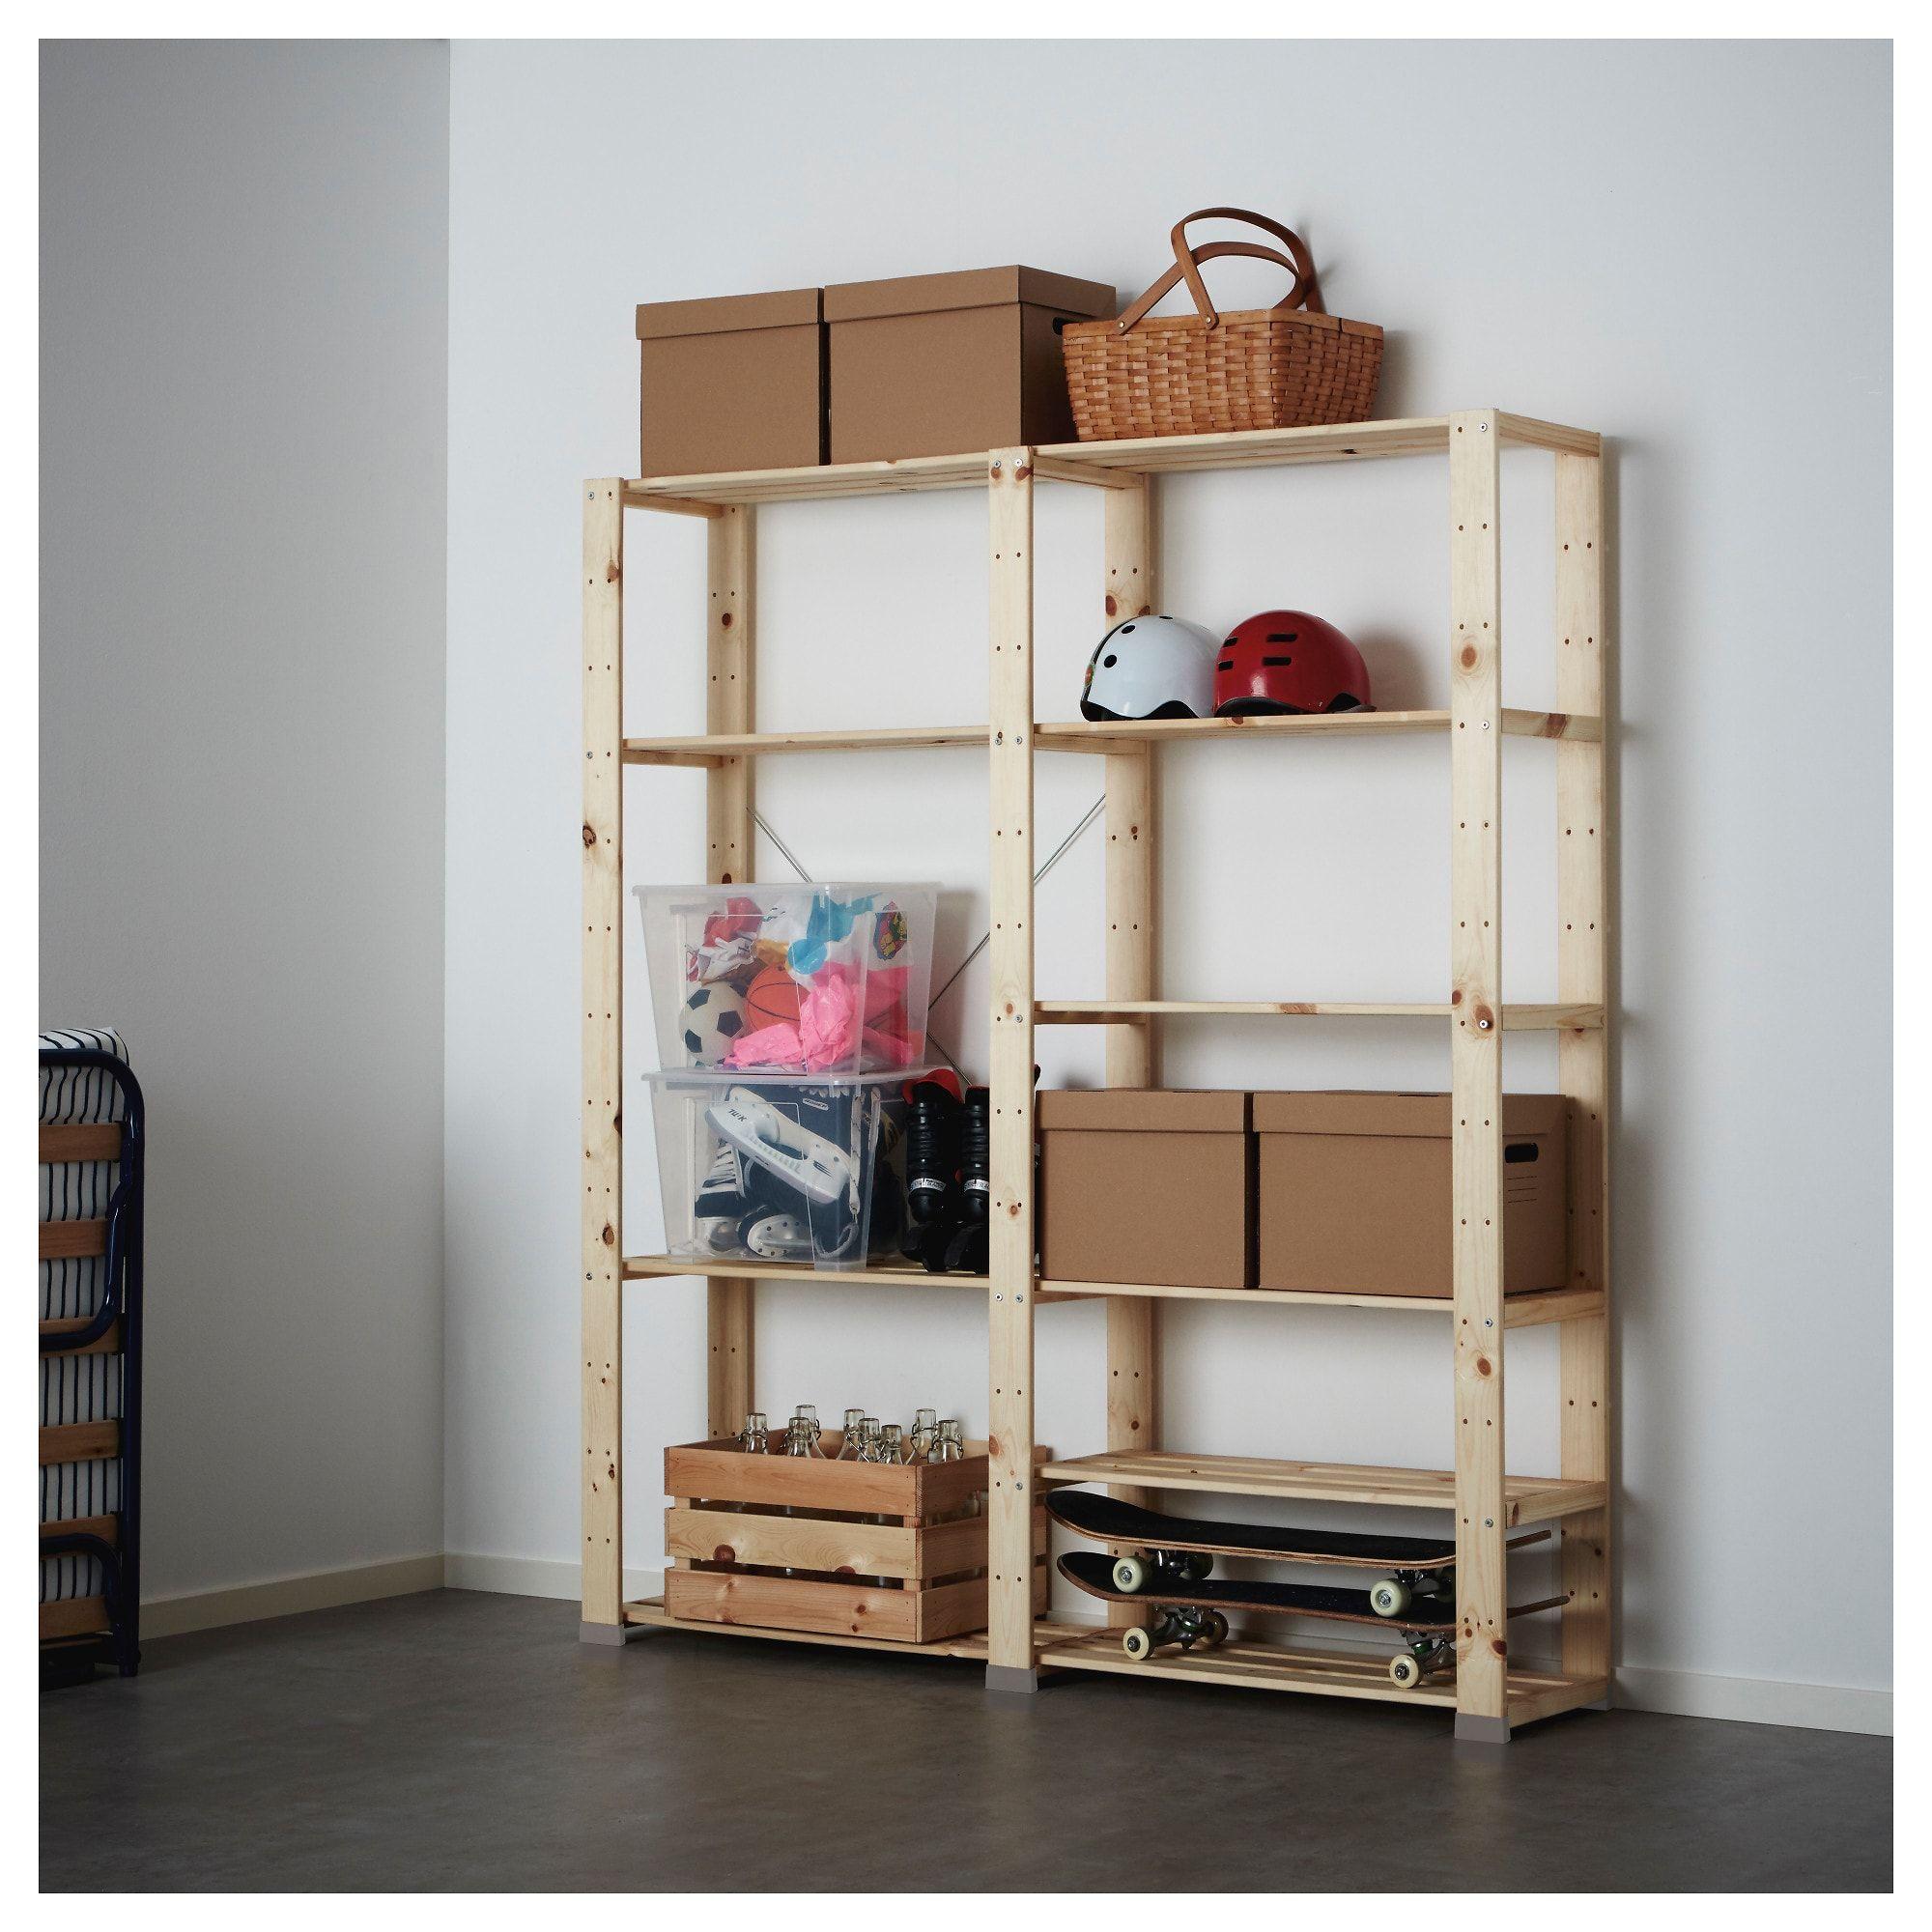 hejne 2 section shelving unit, softwood in 2018 | apt | pinterest